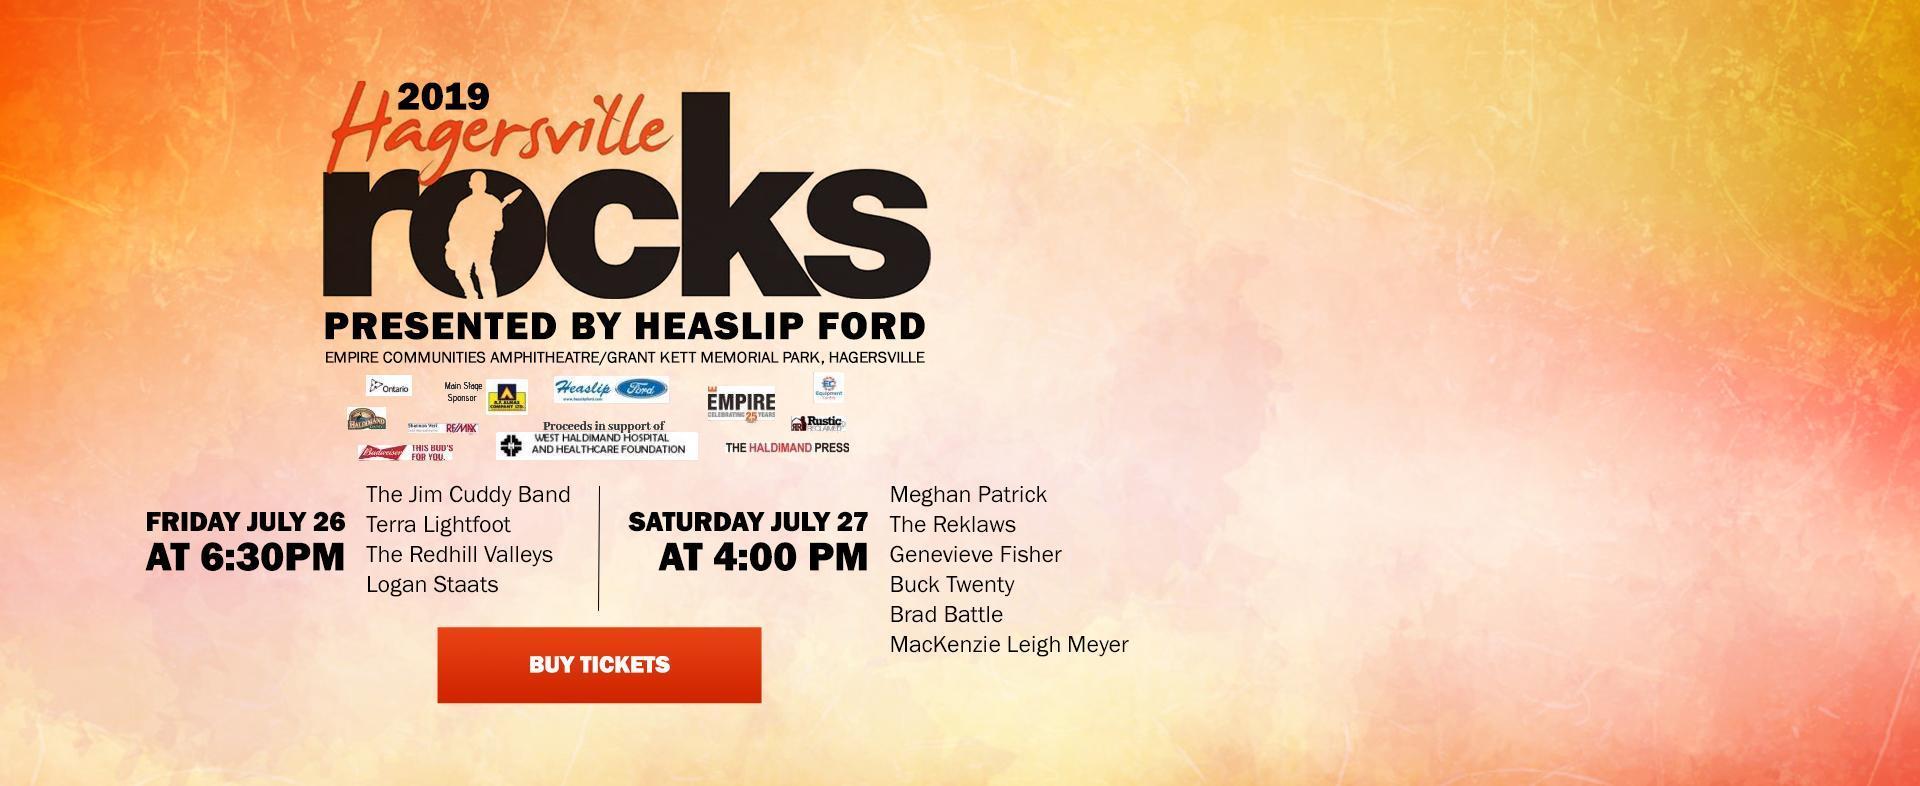 Hagersville Rocks Concert